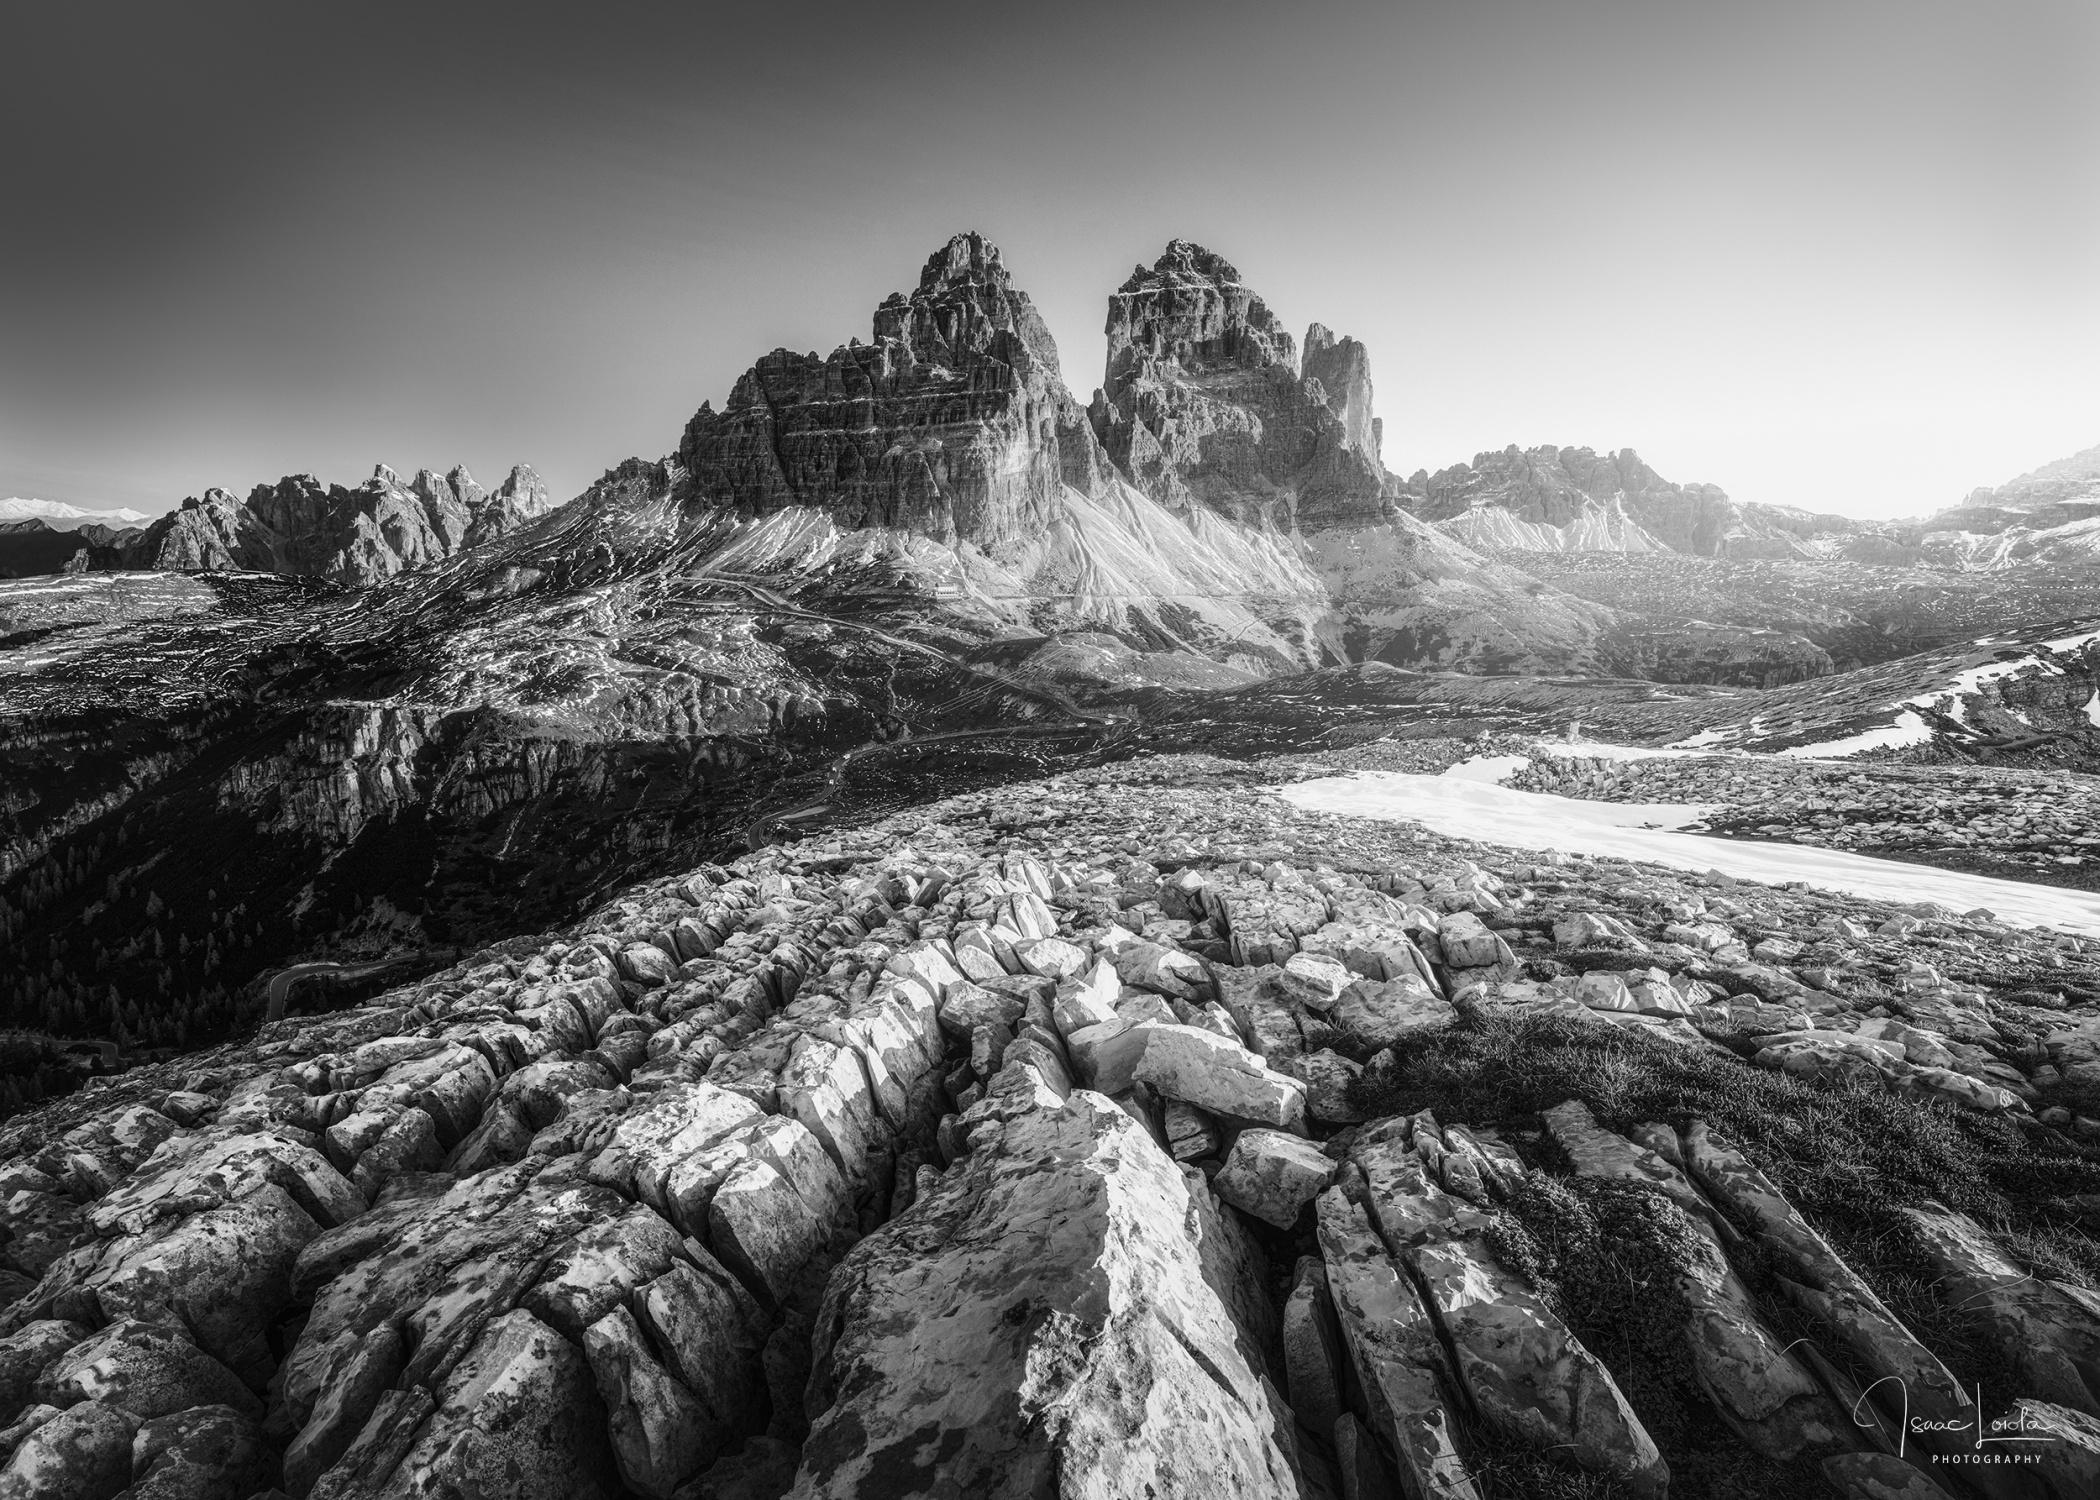 Tre Cime - Monochromo - Isaac Loiola, Photography